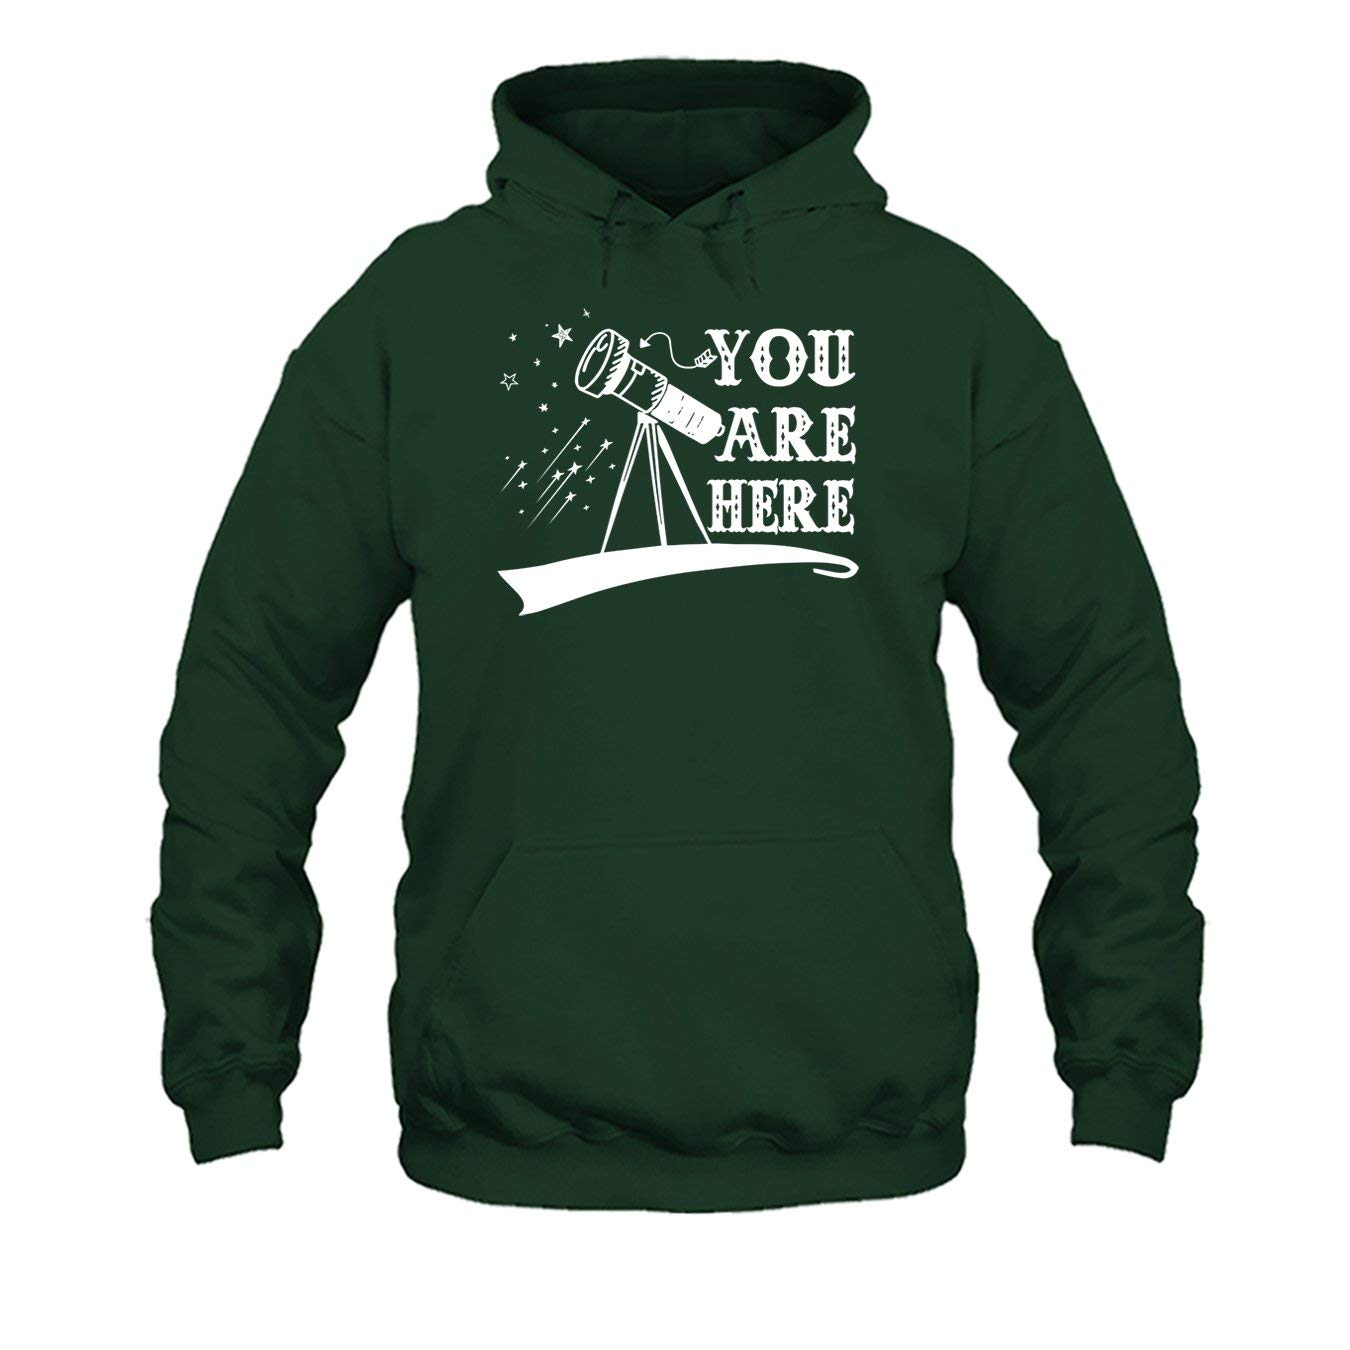 Tee Shirt Sweatshirts Sheep Fly Funny Astronomer T Shirt